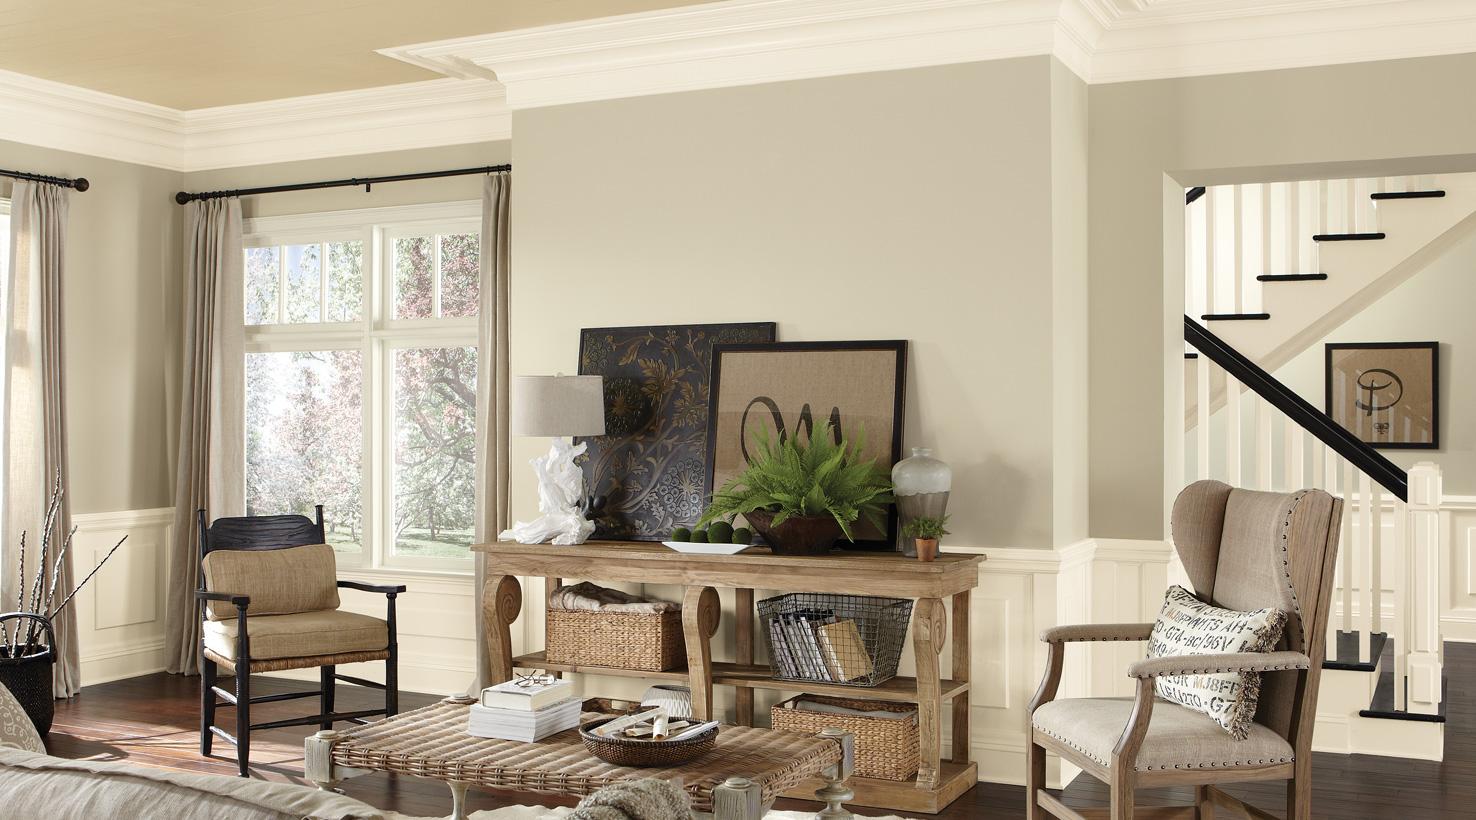 living room paint color ideas inspiration gallery on best laundry room paint color ideas with wood trim id=23383